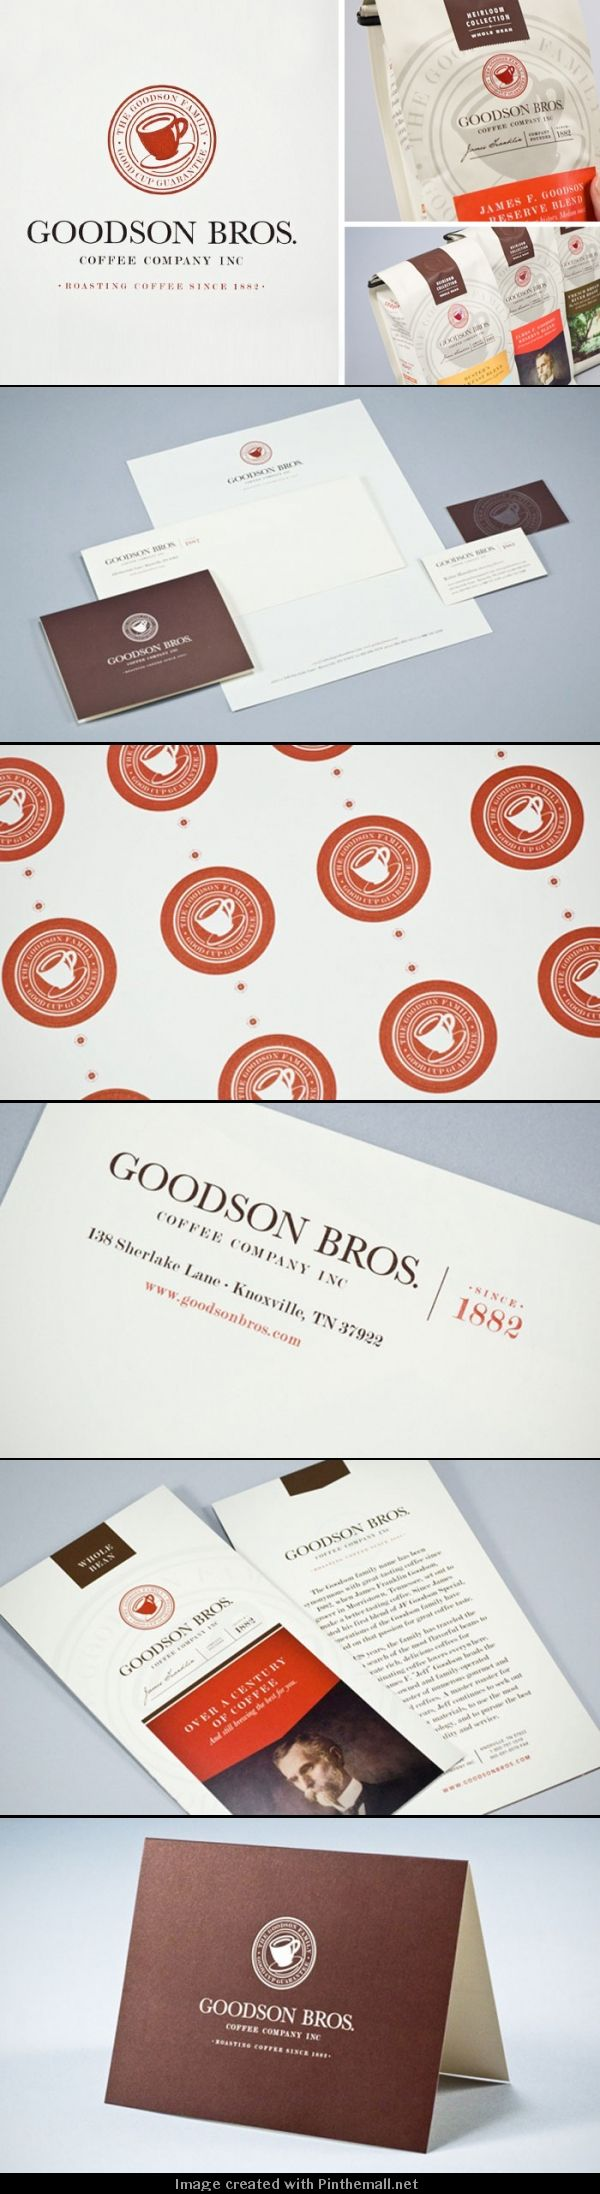 Goodson Bros. Coffee Company Inc.